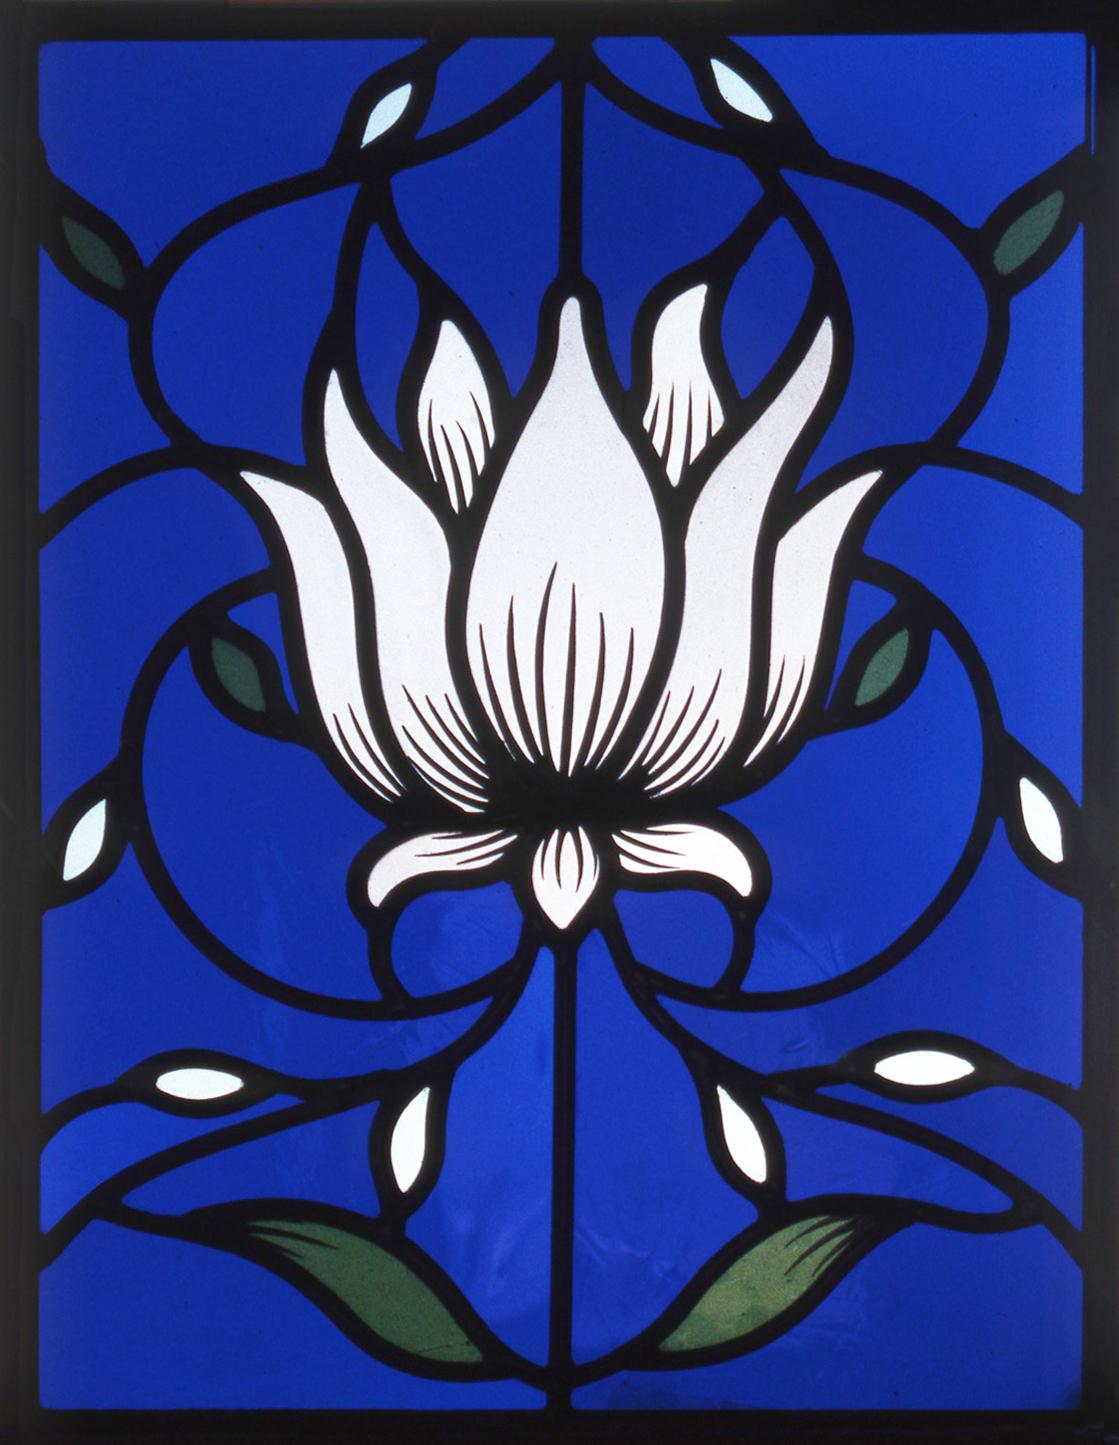 White Lotus panel after William Morris.